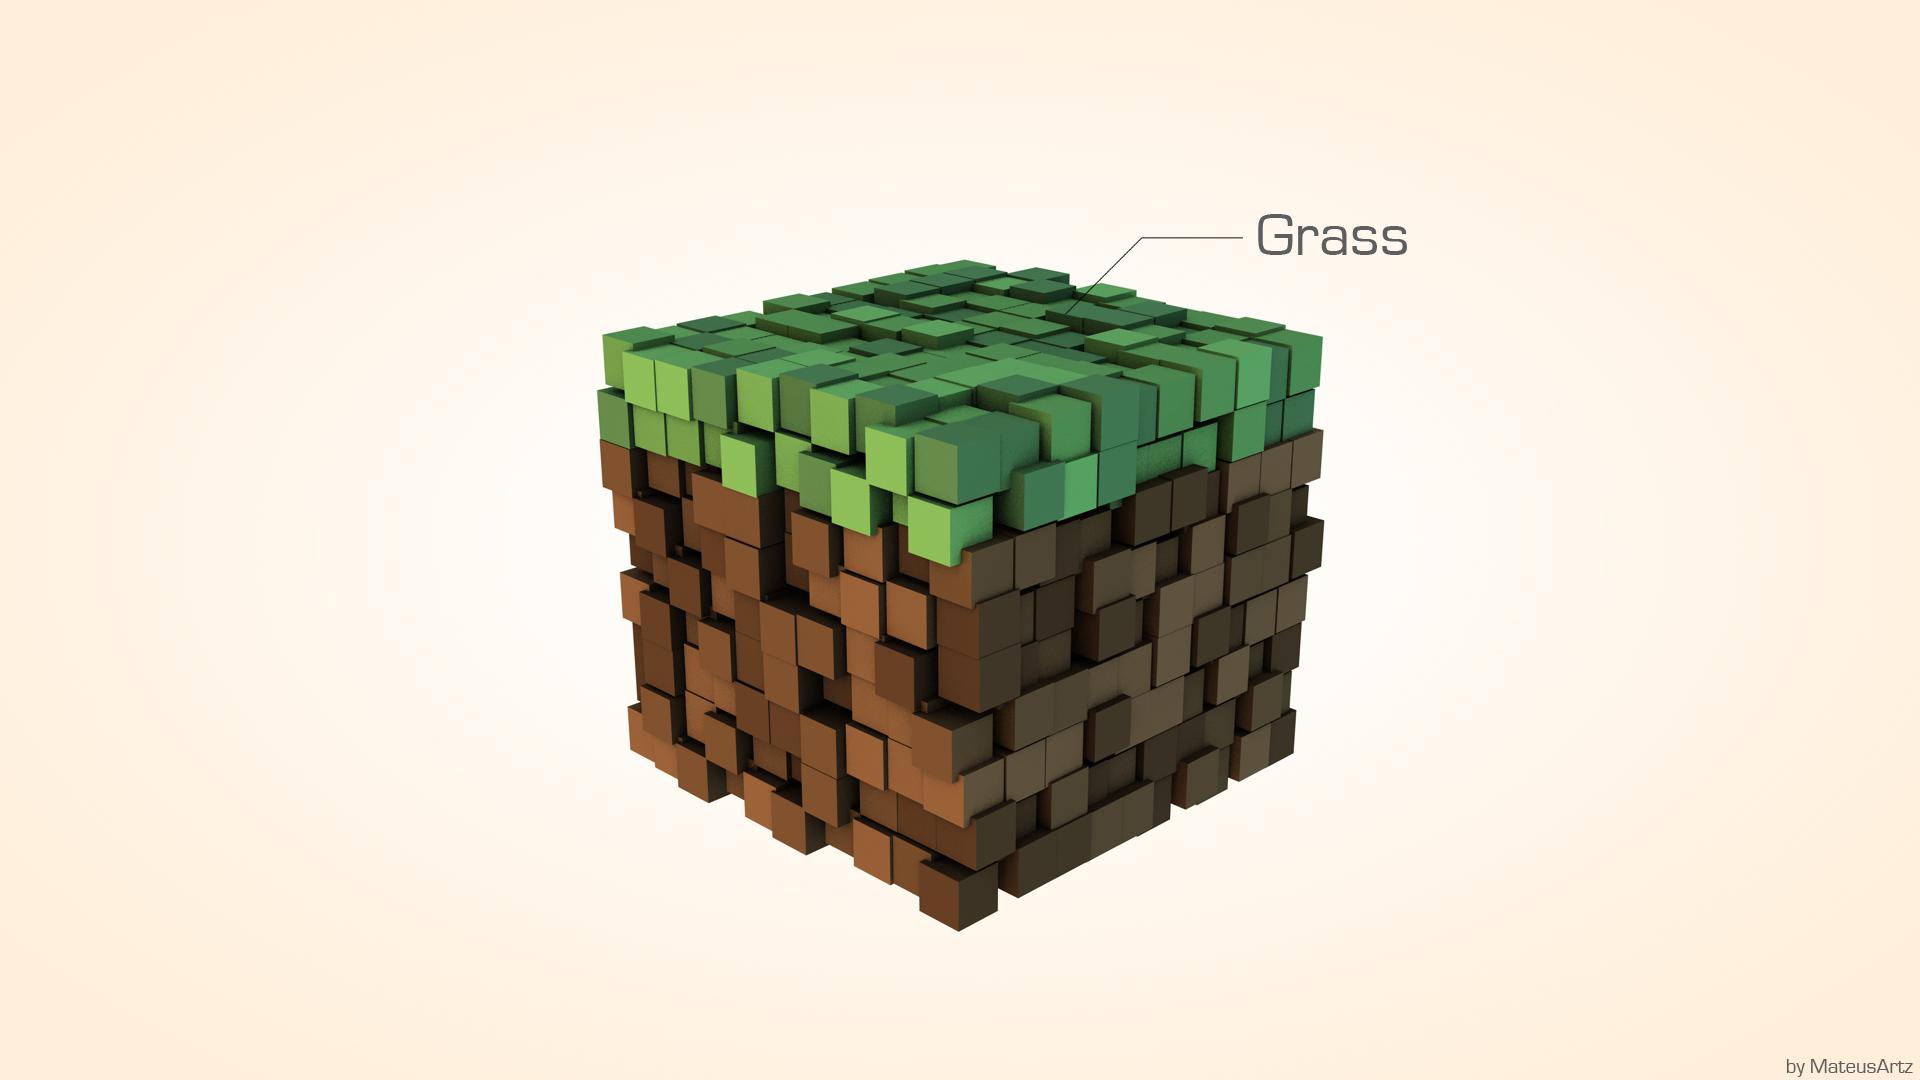 Popular Wallpaper Minecraft Minimalistic - minecraft_minimalist___grass_by_mateusrm94-d4hlh2x  Snapshot_827153.jpg